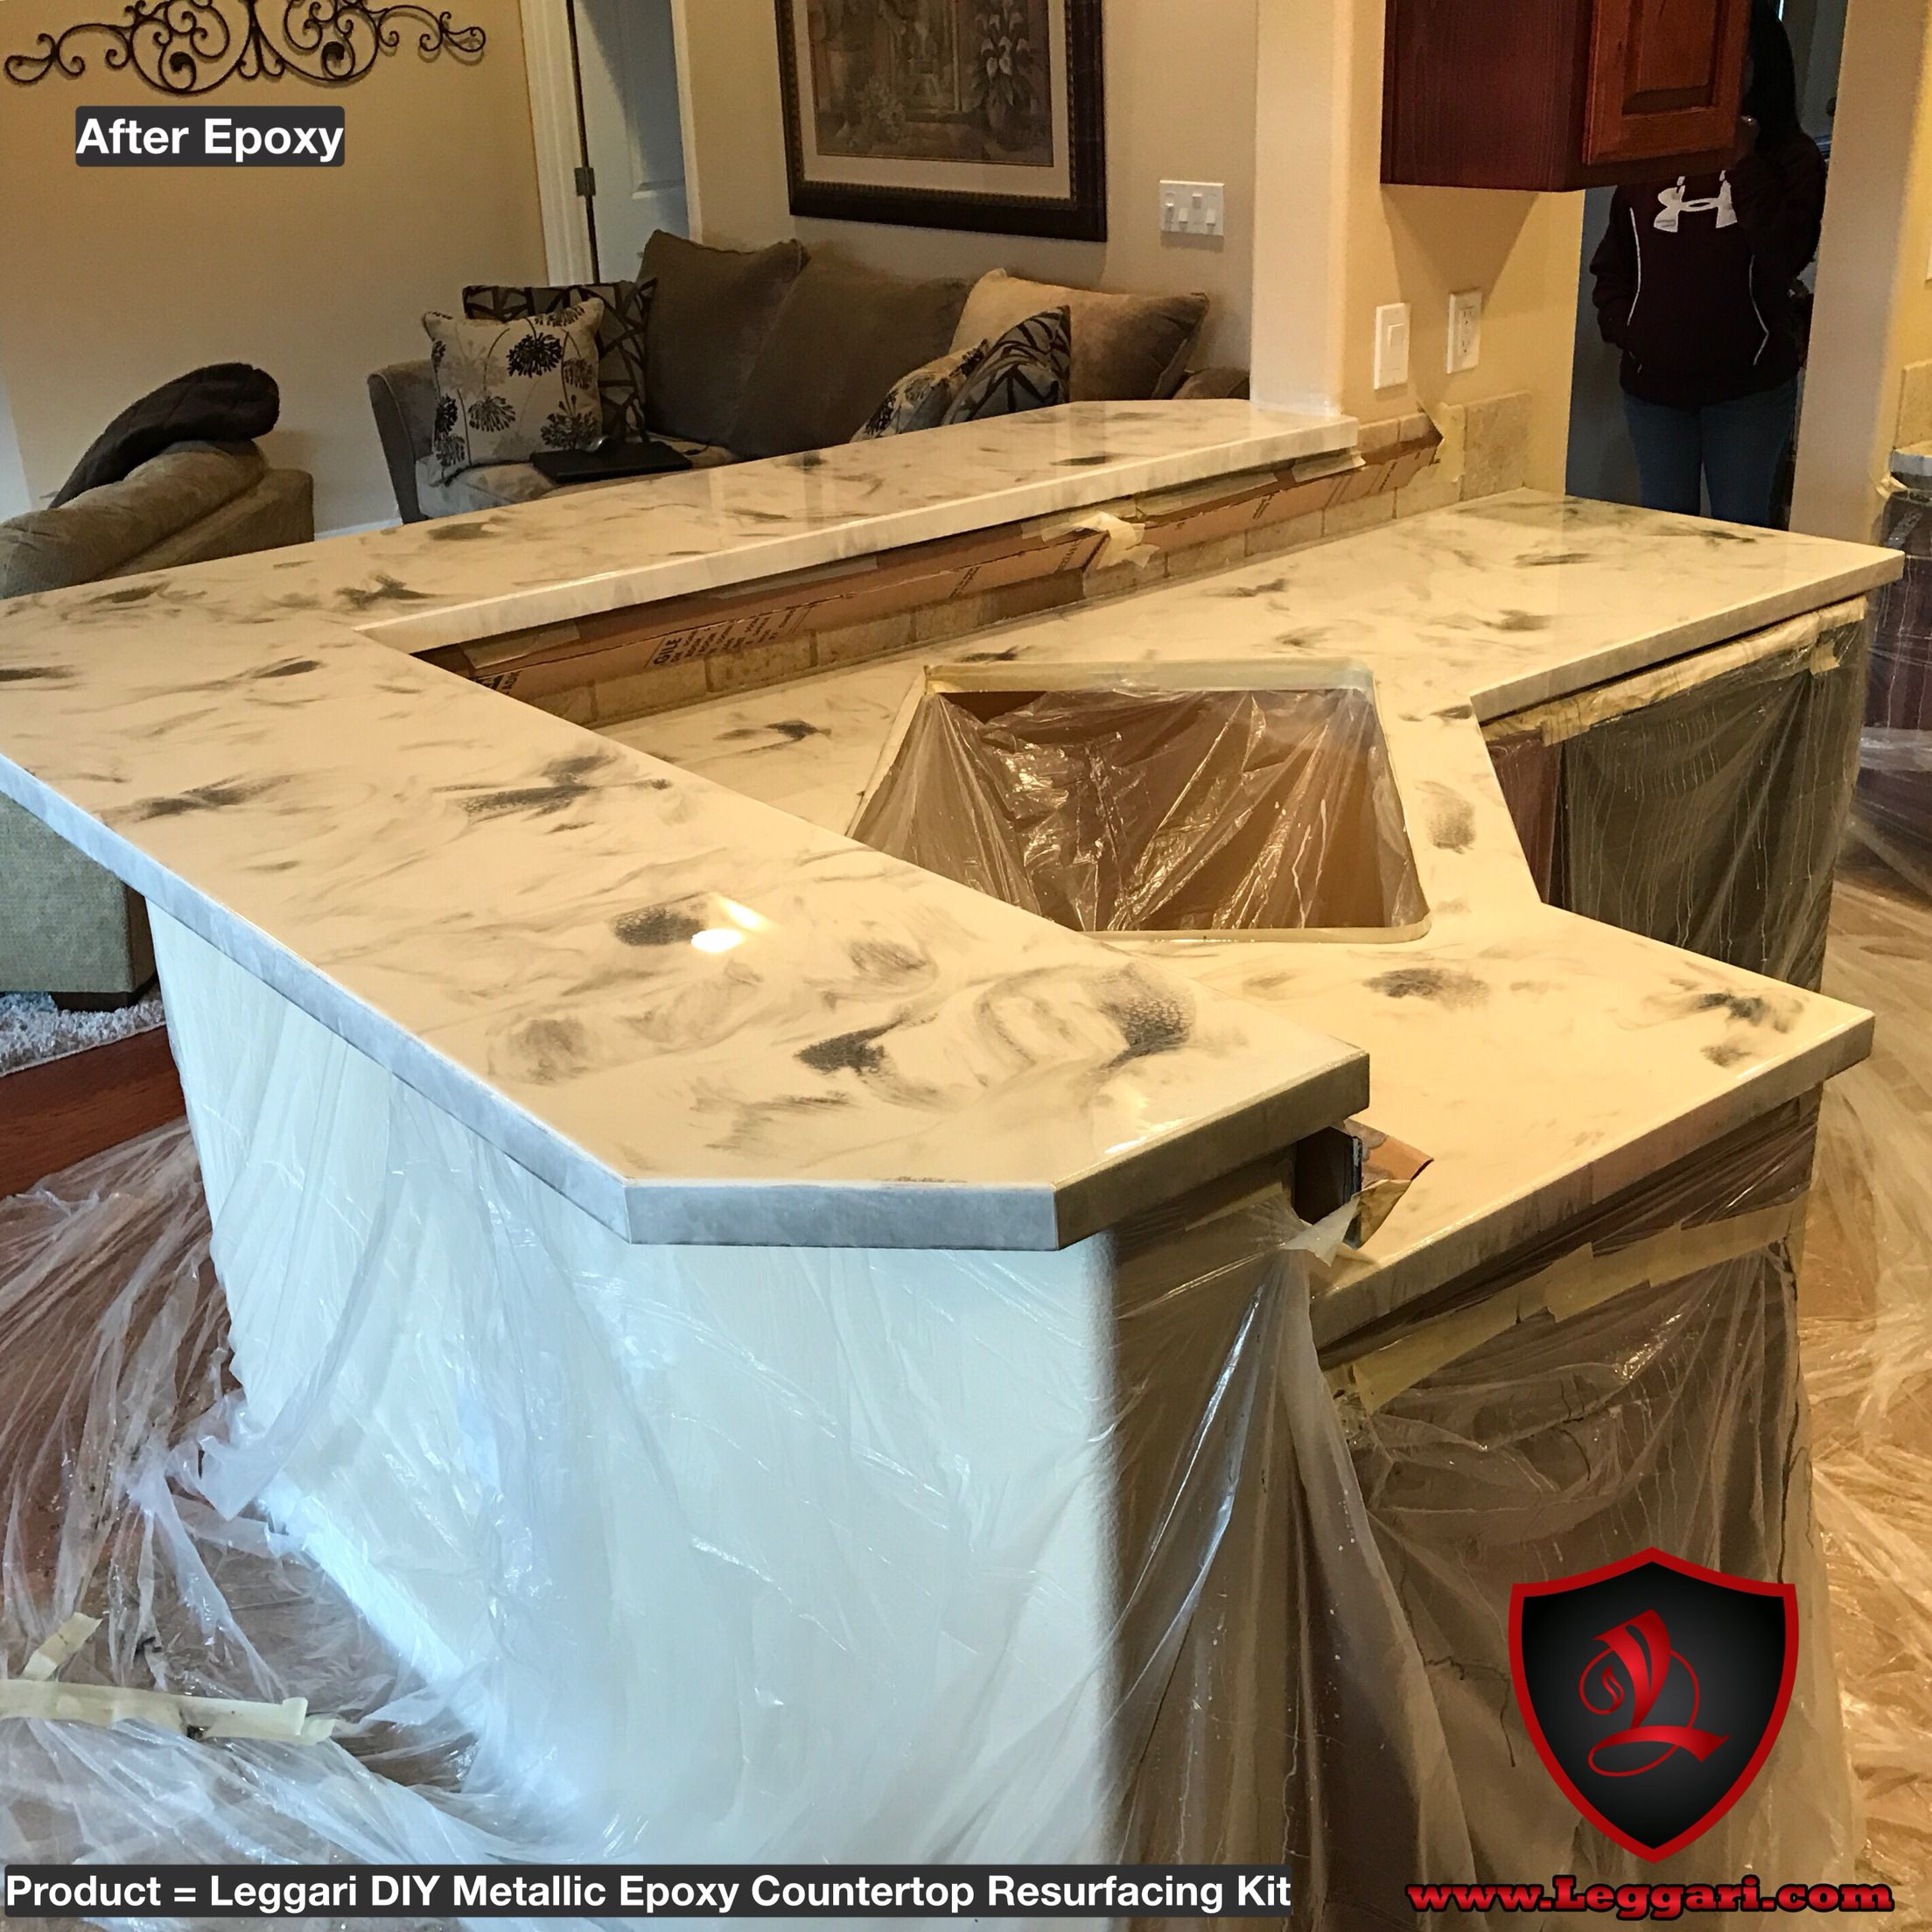 Diy Metallic Epoxy Countertop Kit Installed In A